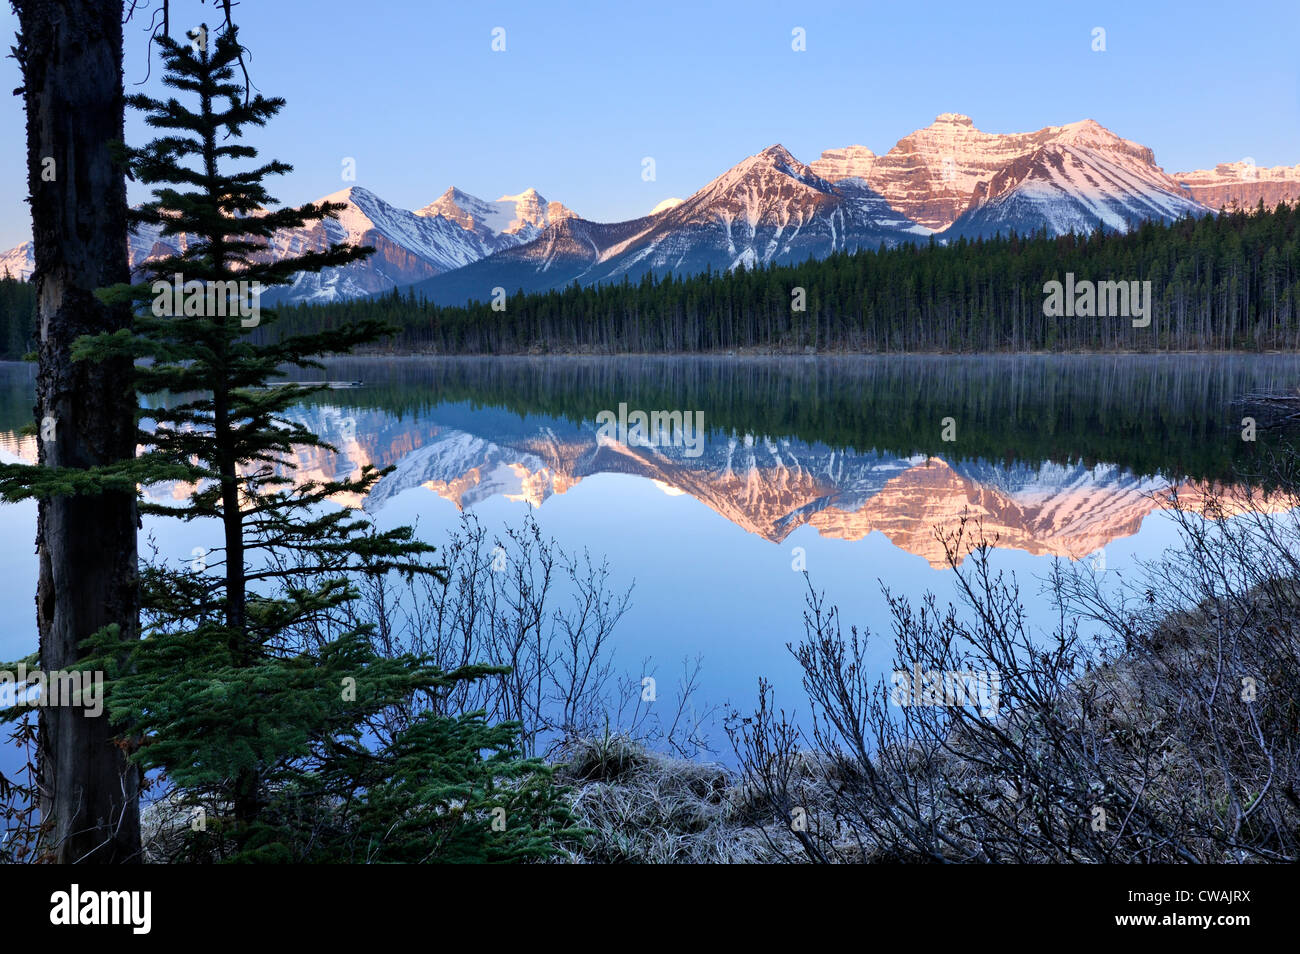 Herbert Lago Bow y rango, Parque Nacional de Banff, Alberta, Canadá Imagen De Stock